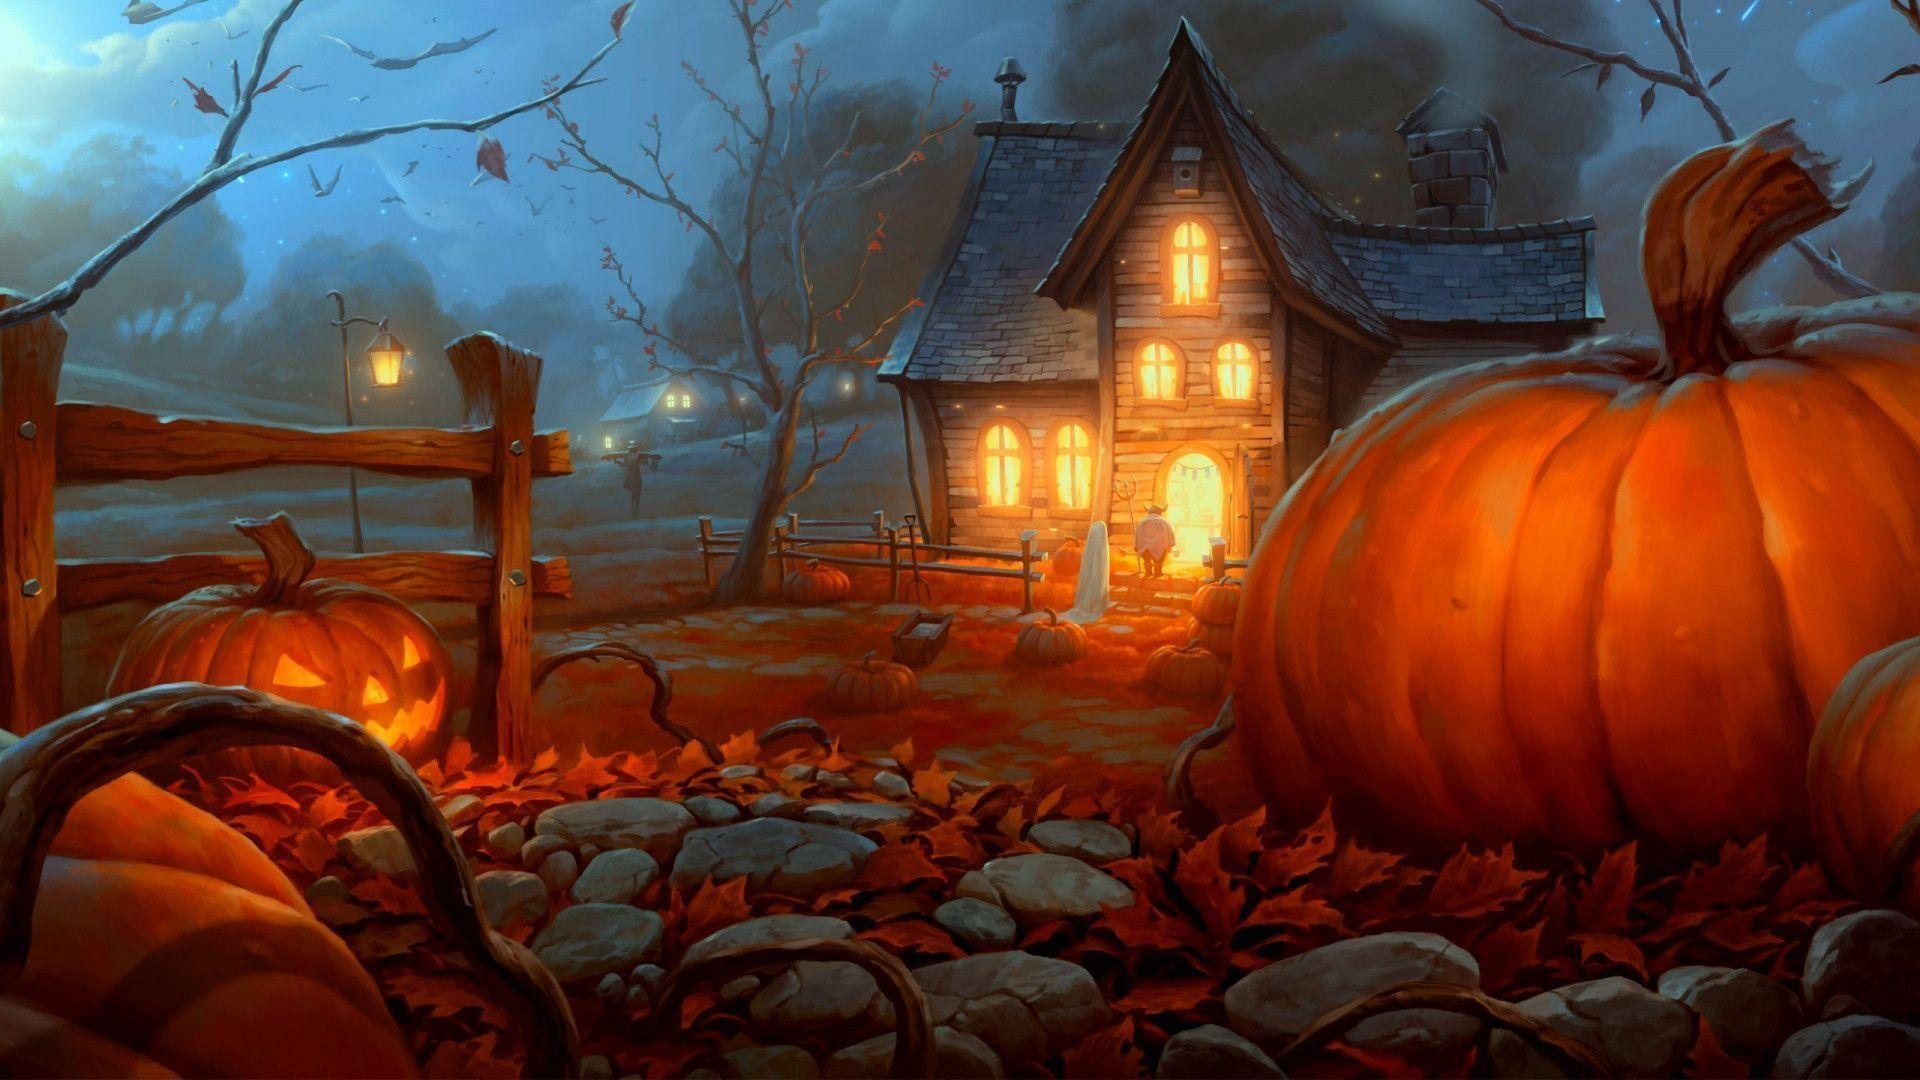 Wonderful Wallpaper Halloween Windows 7 - 1137441-hd-halloween-wallpapers-1080p-1920x1080-windows  Graphic_481672.jpg